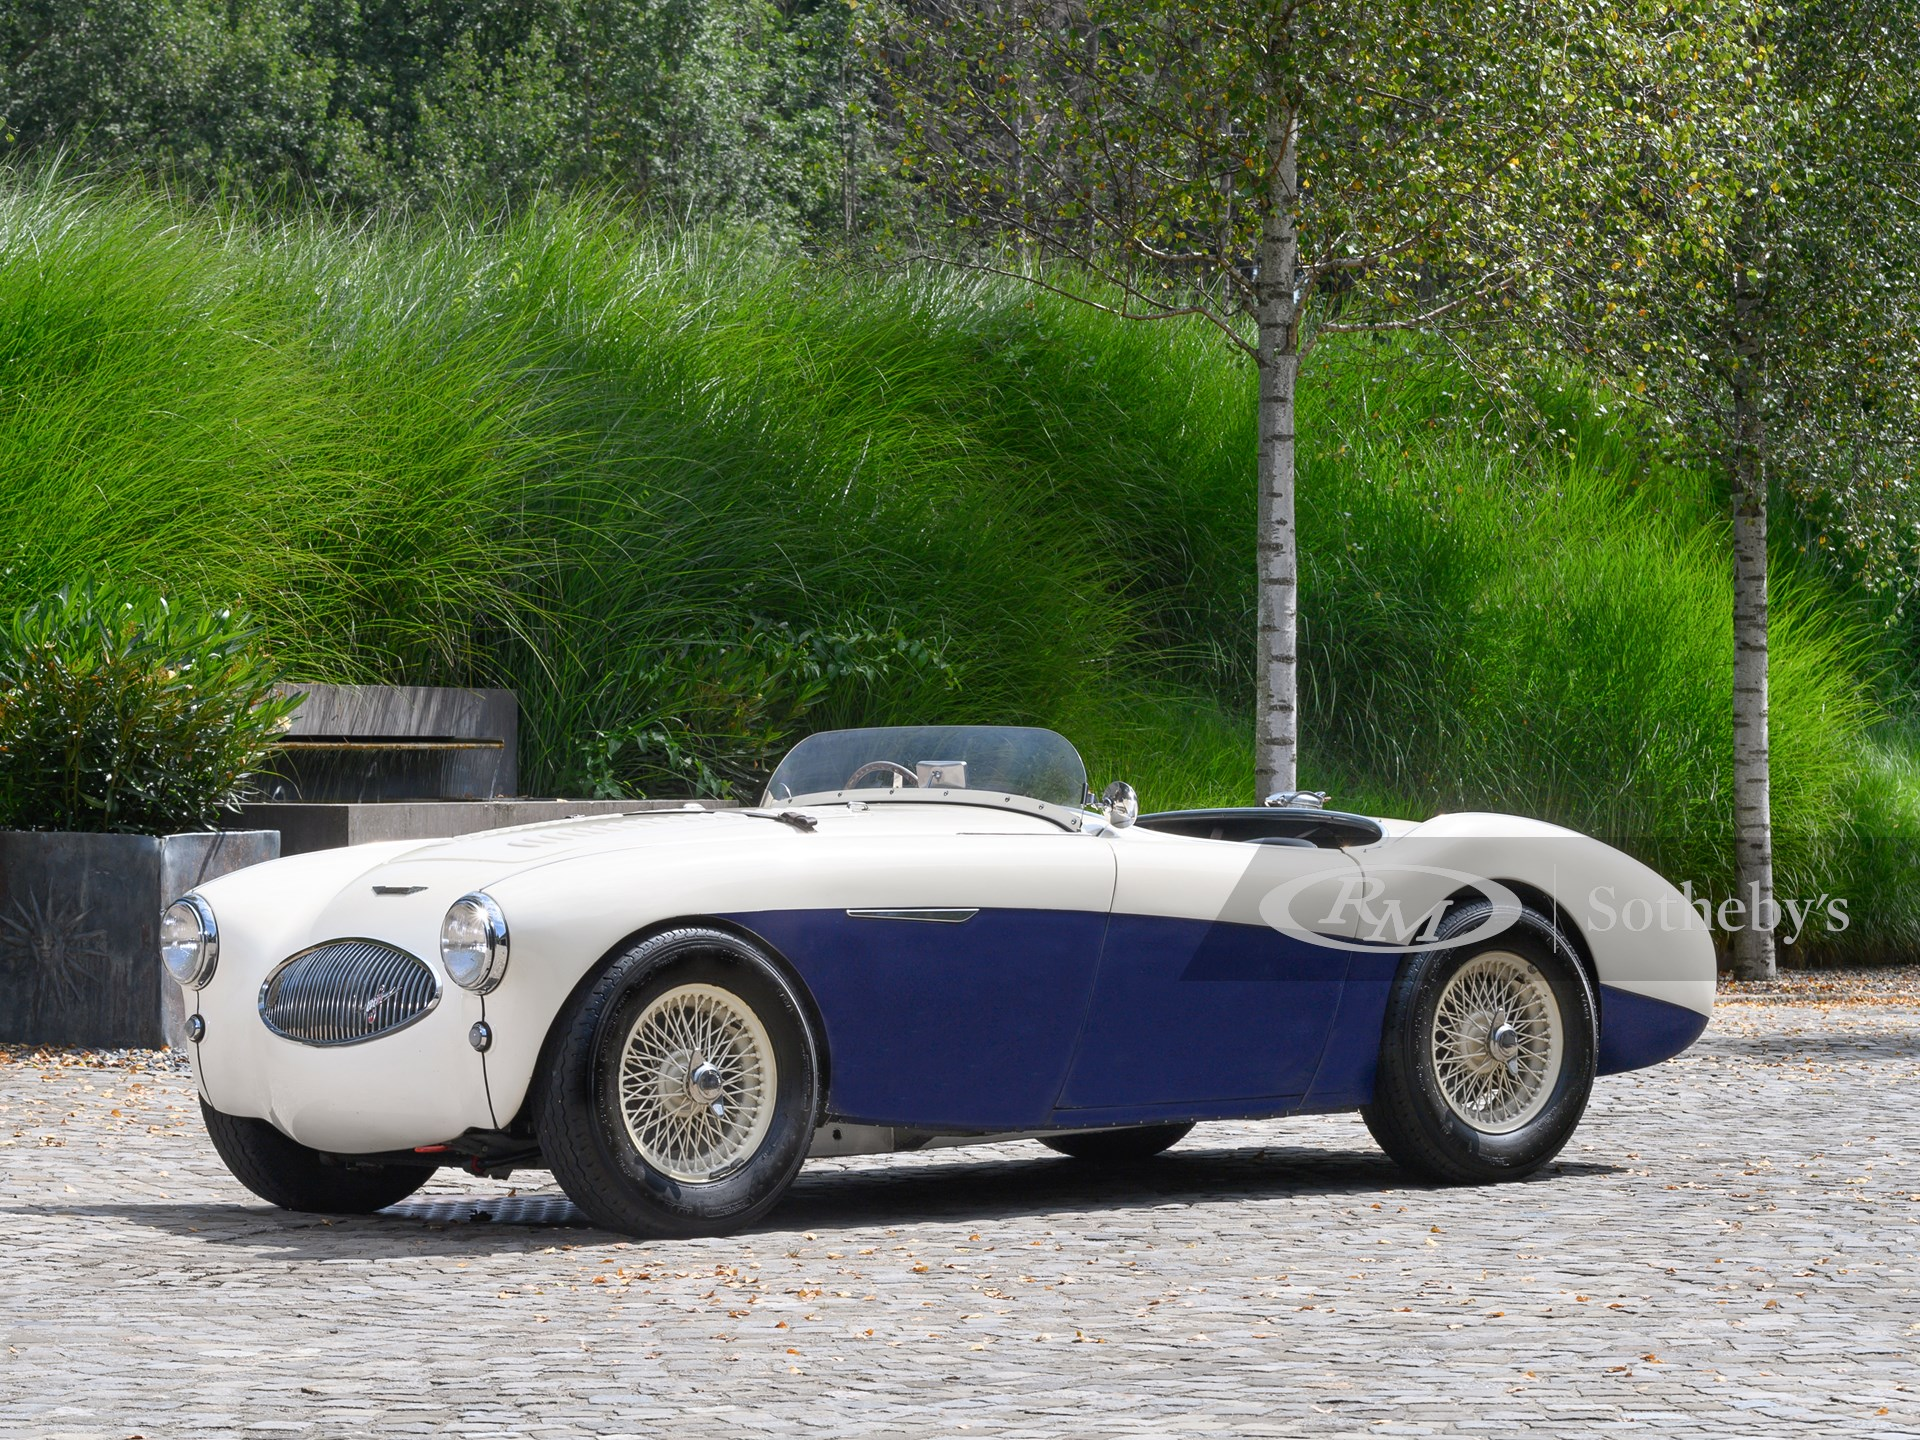 1955 Austin-Healey 100S (Tim Scott ©2021 Courtesy of RM Sotheby's)